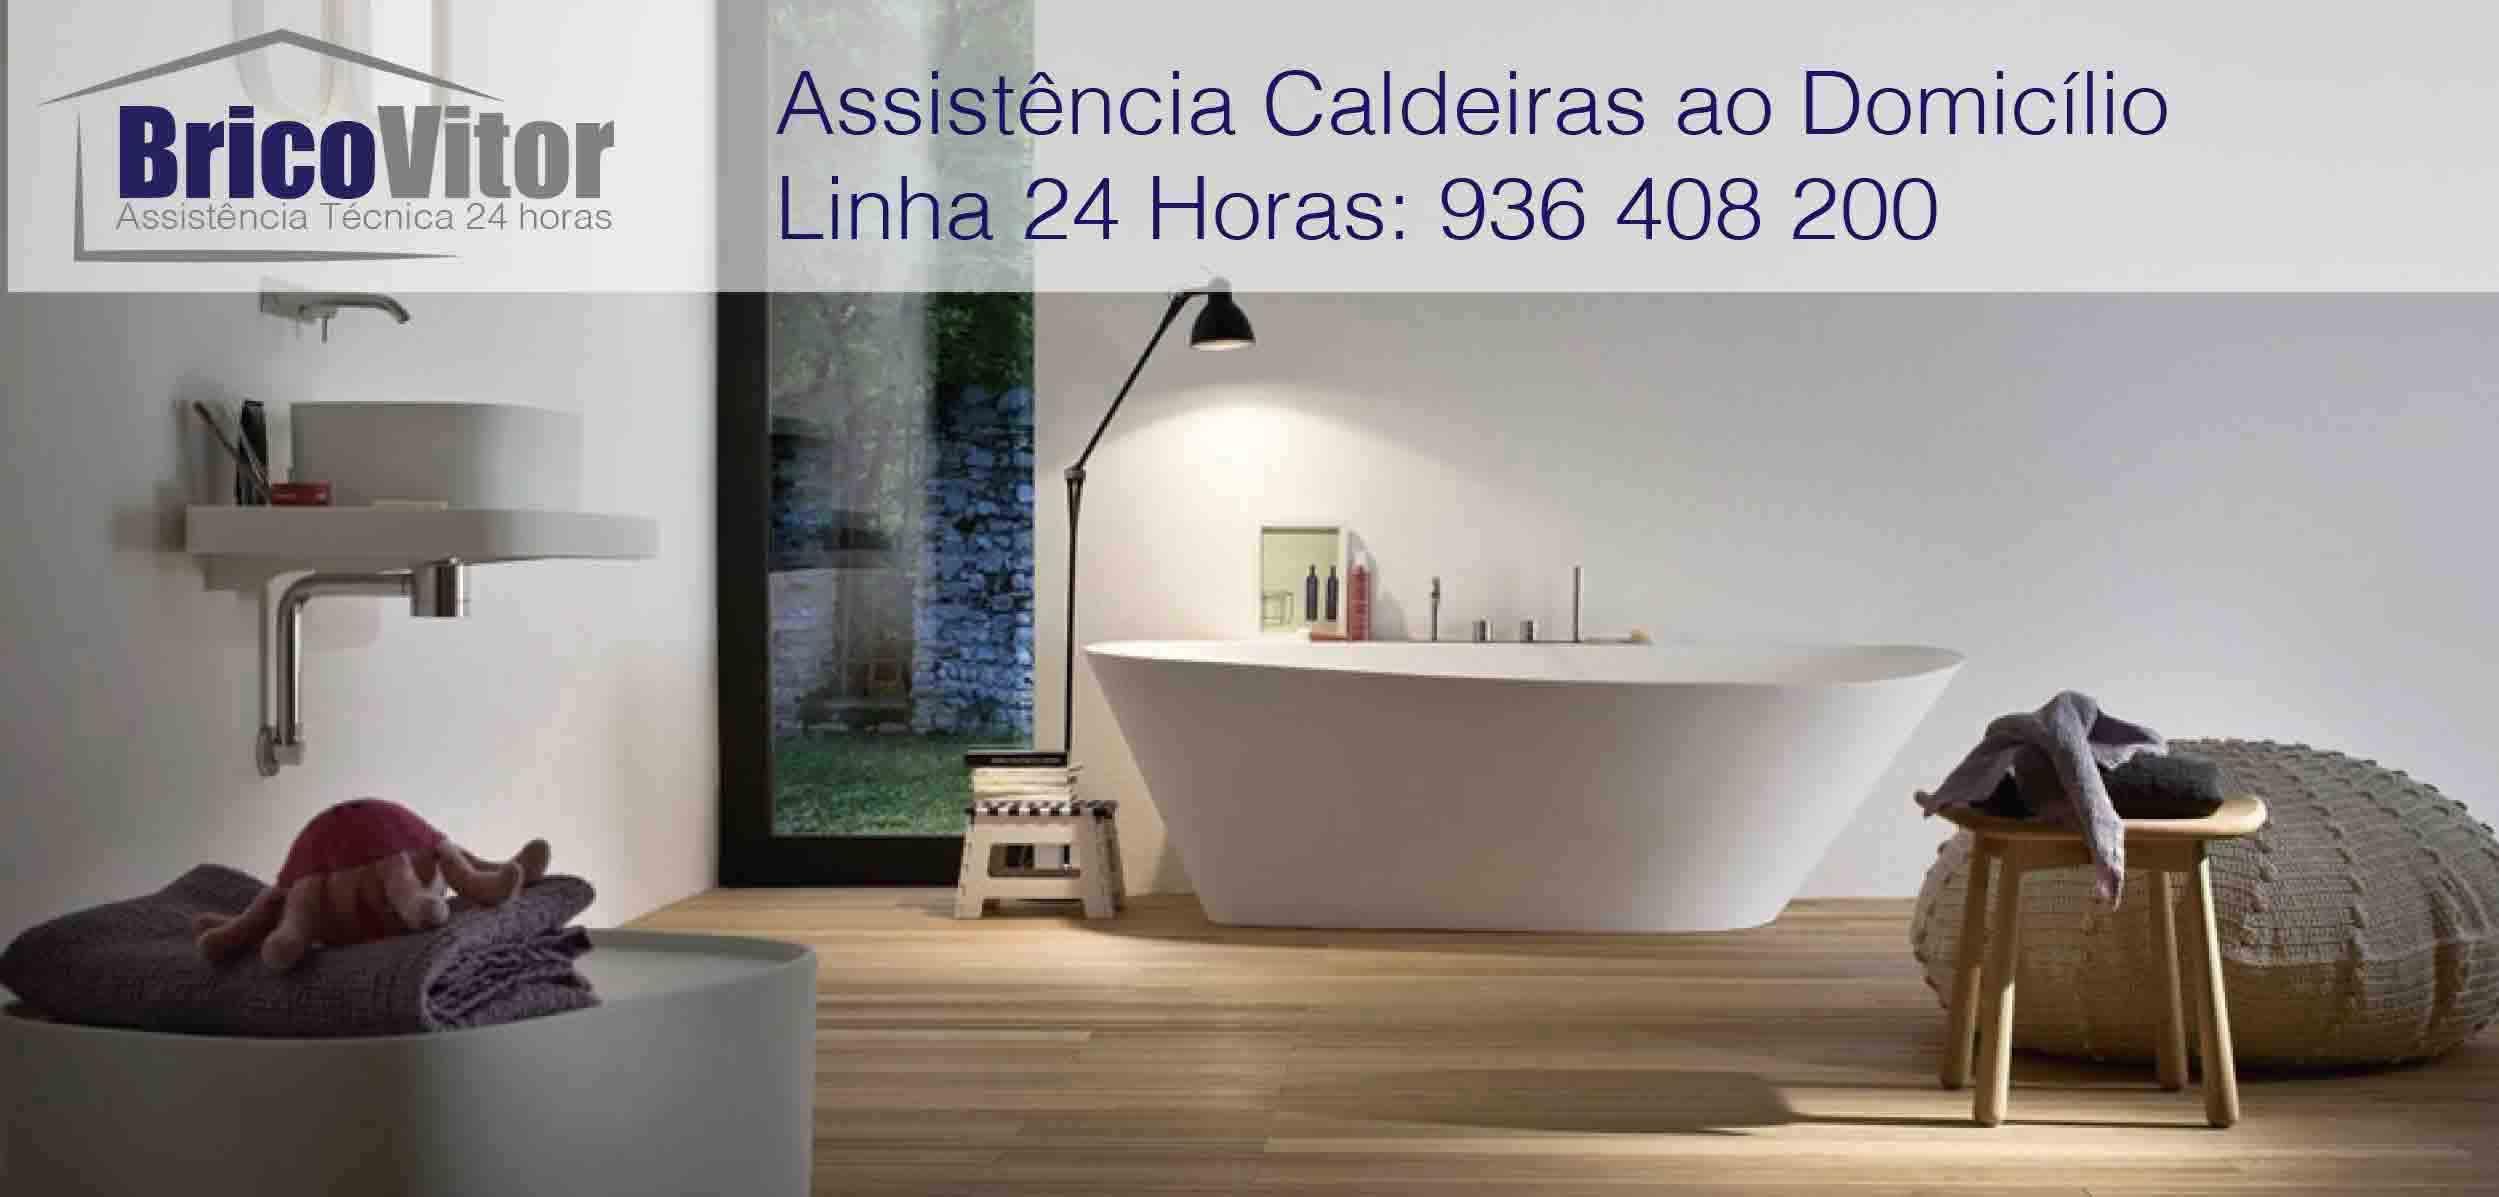 Assistência Caldeiras Reboleira, Amadora - Lisboa